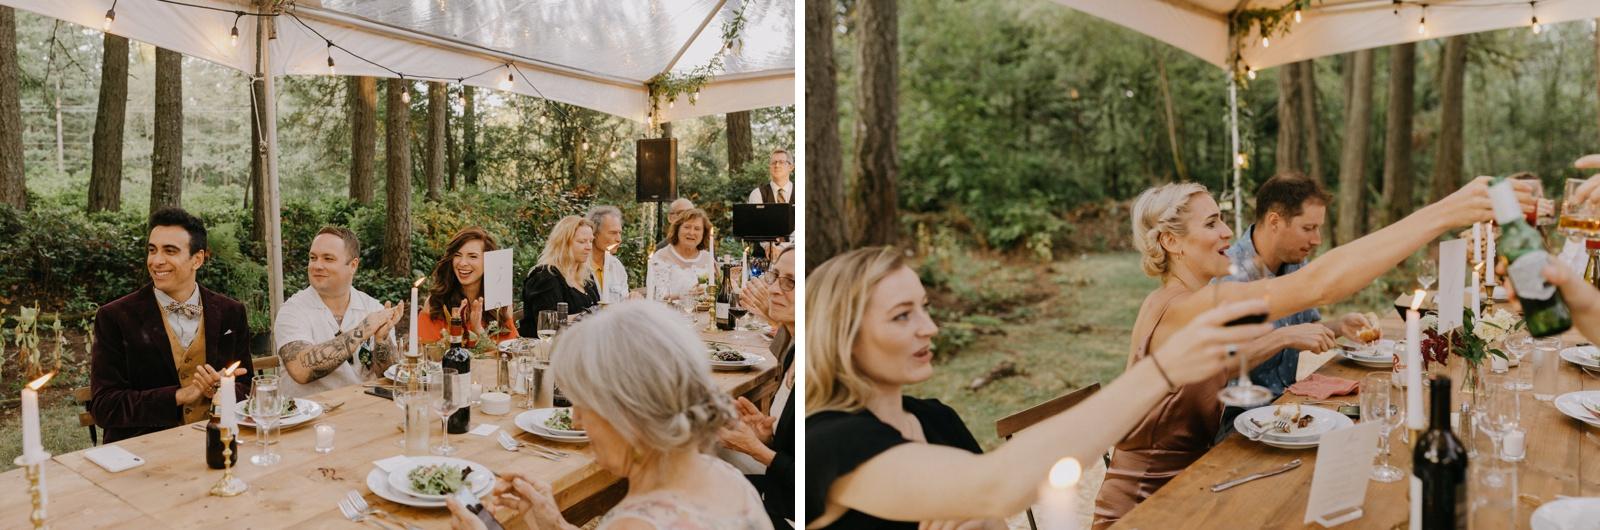 Matthew and Autumn Intimate Outdoor Backyard Wedding_0185